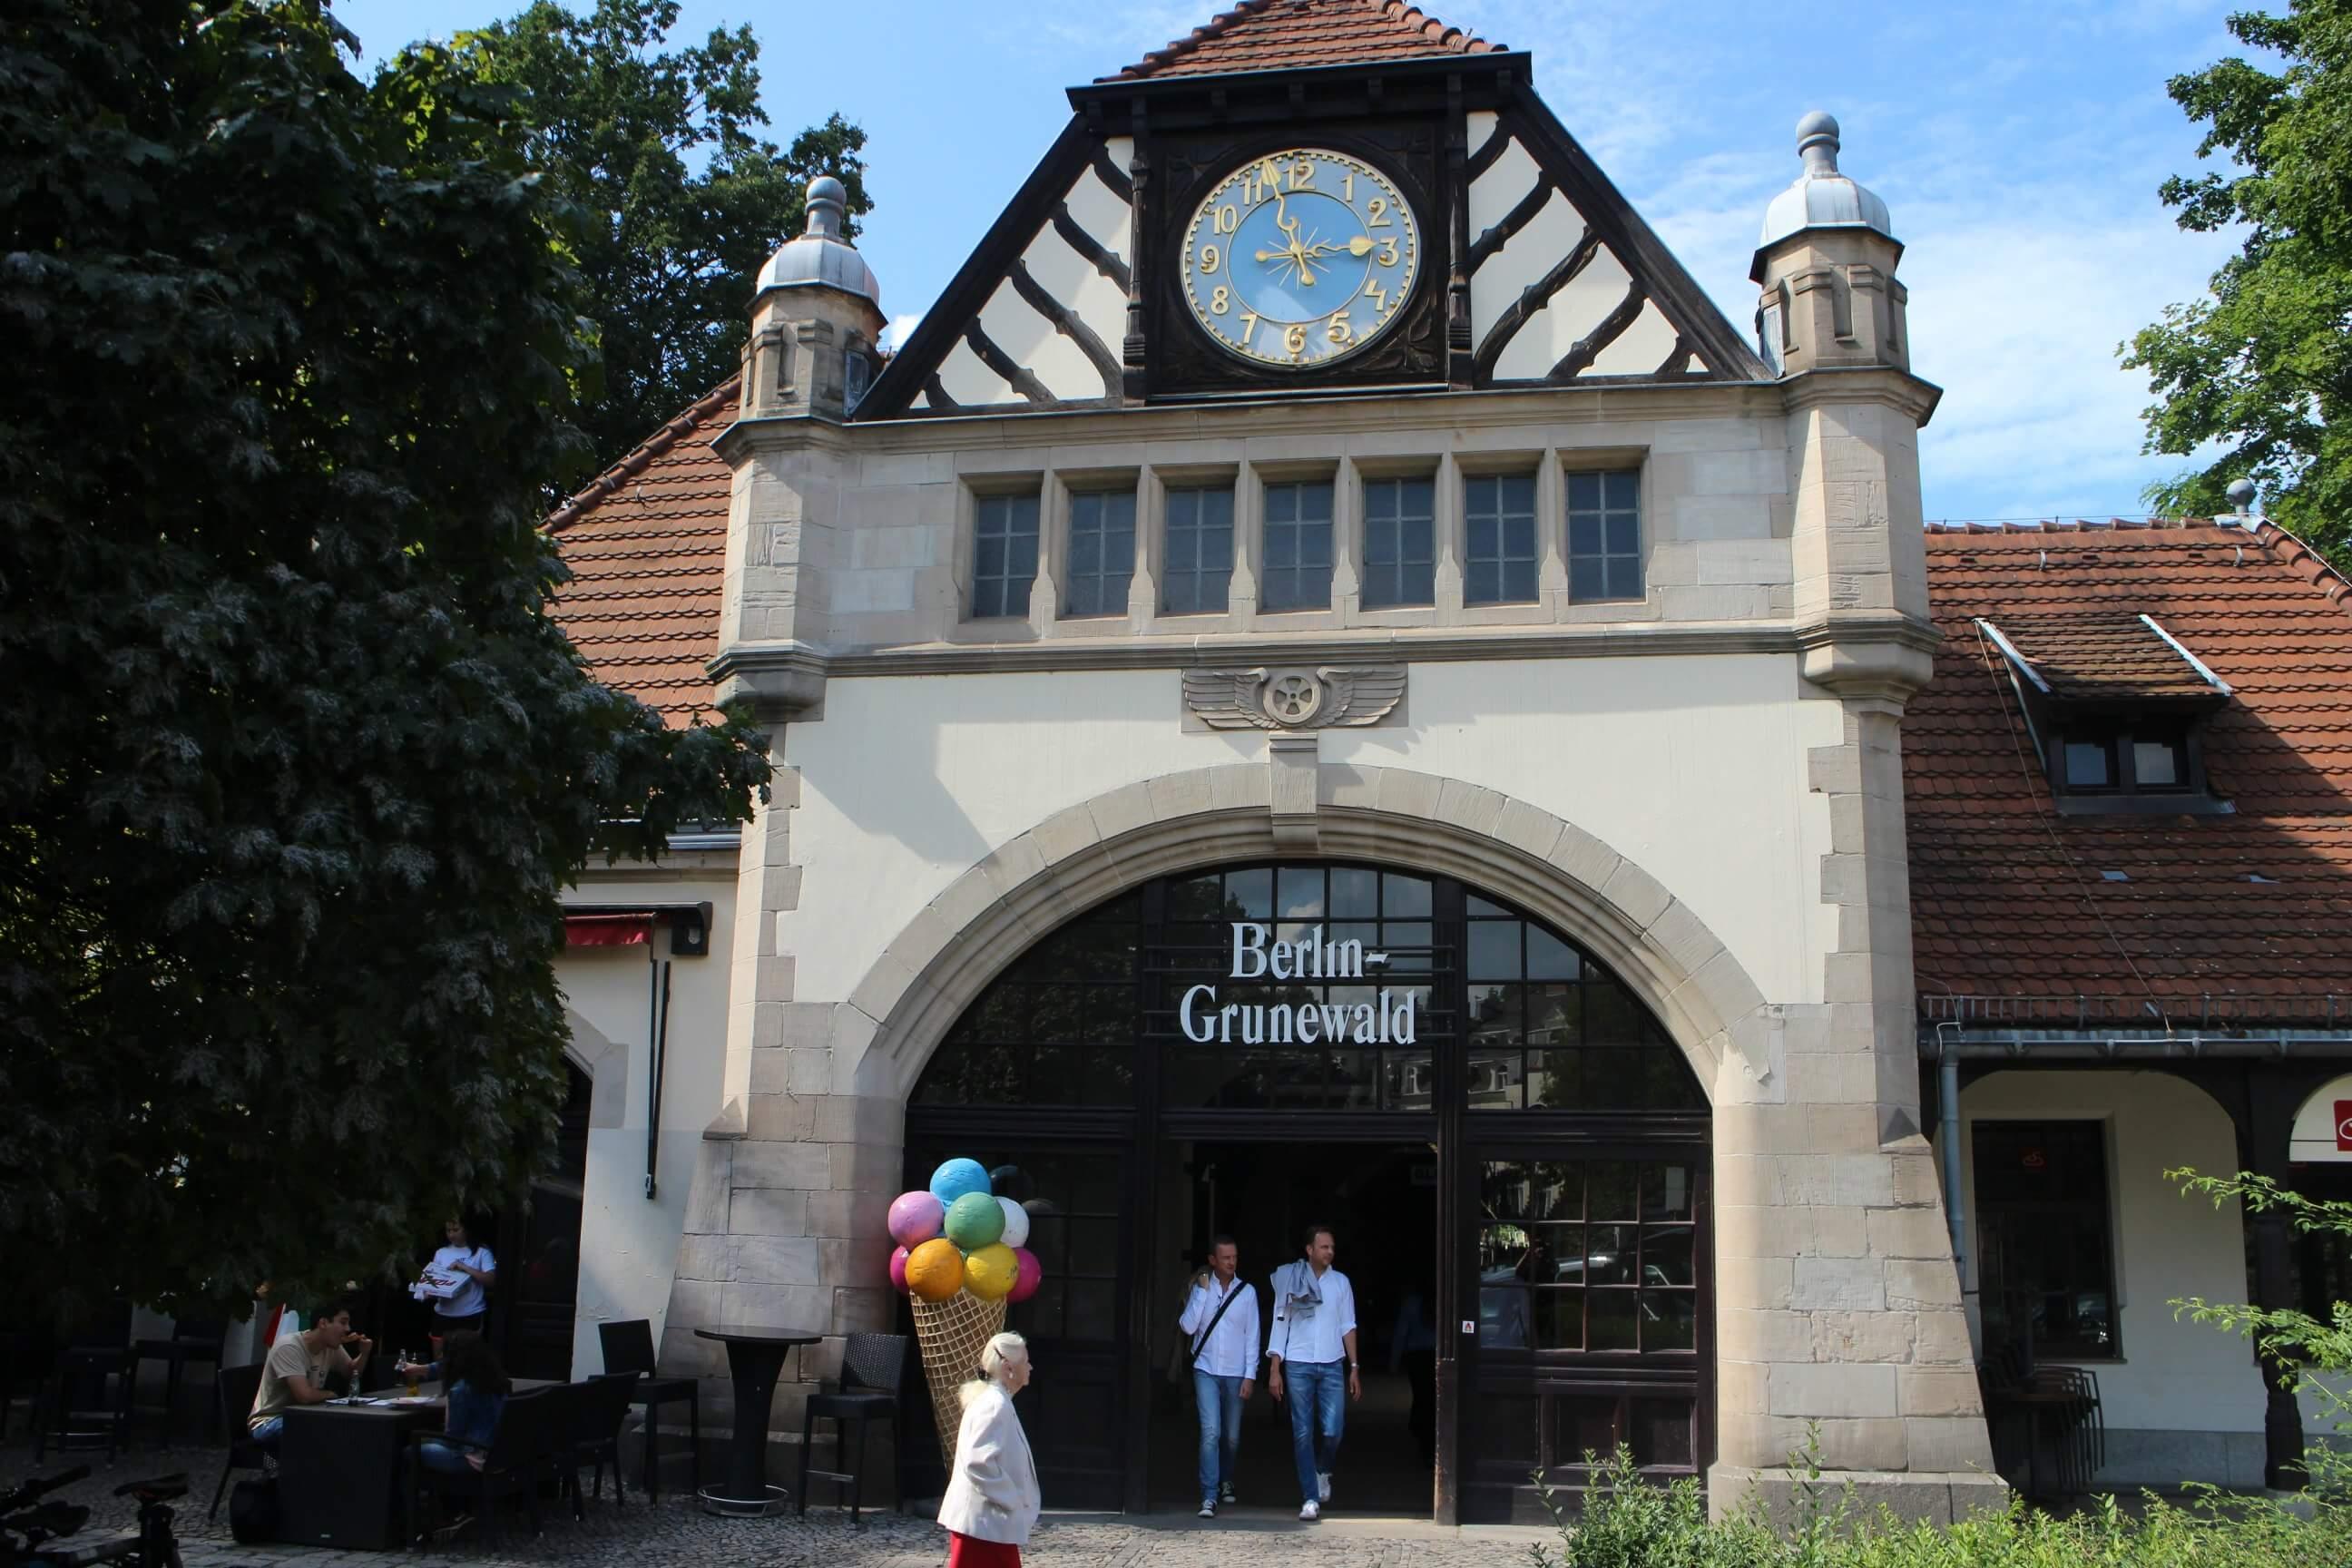 station Grunewald